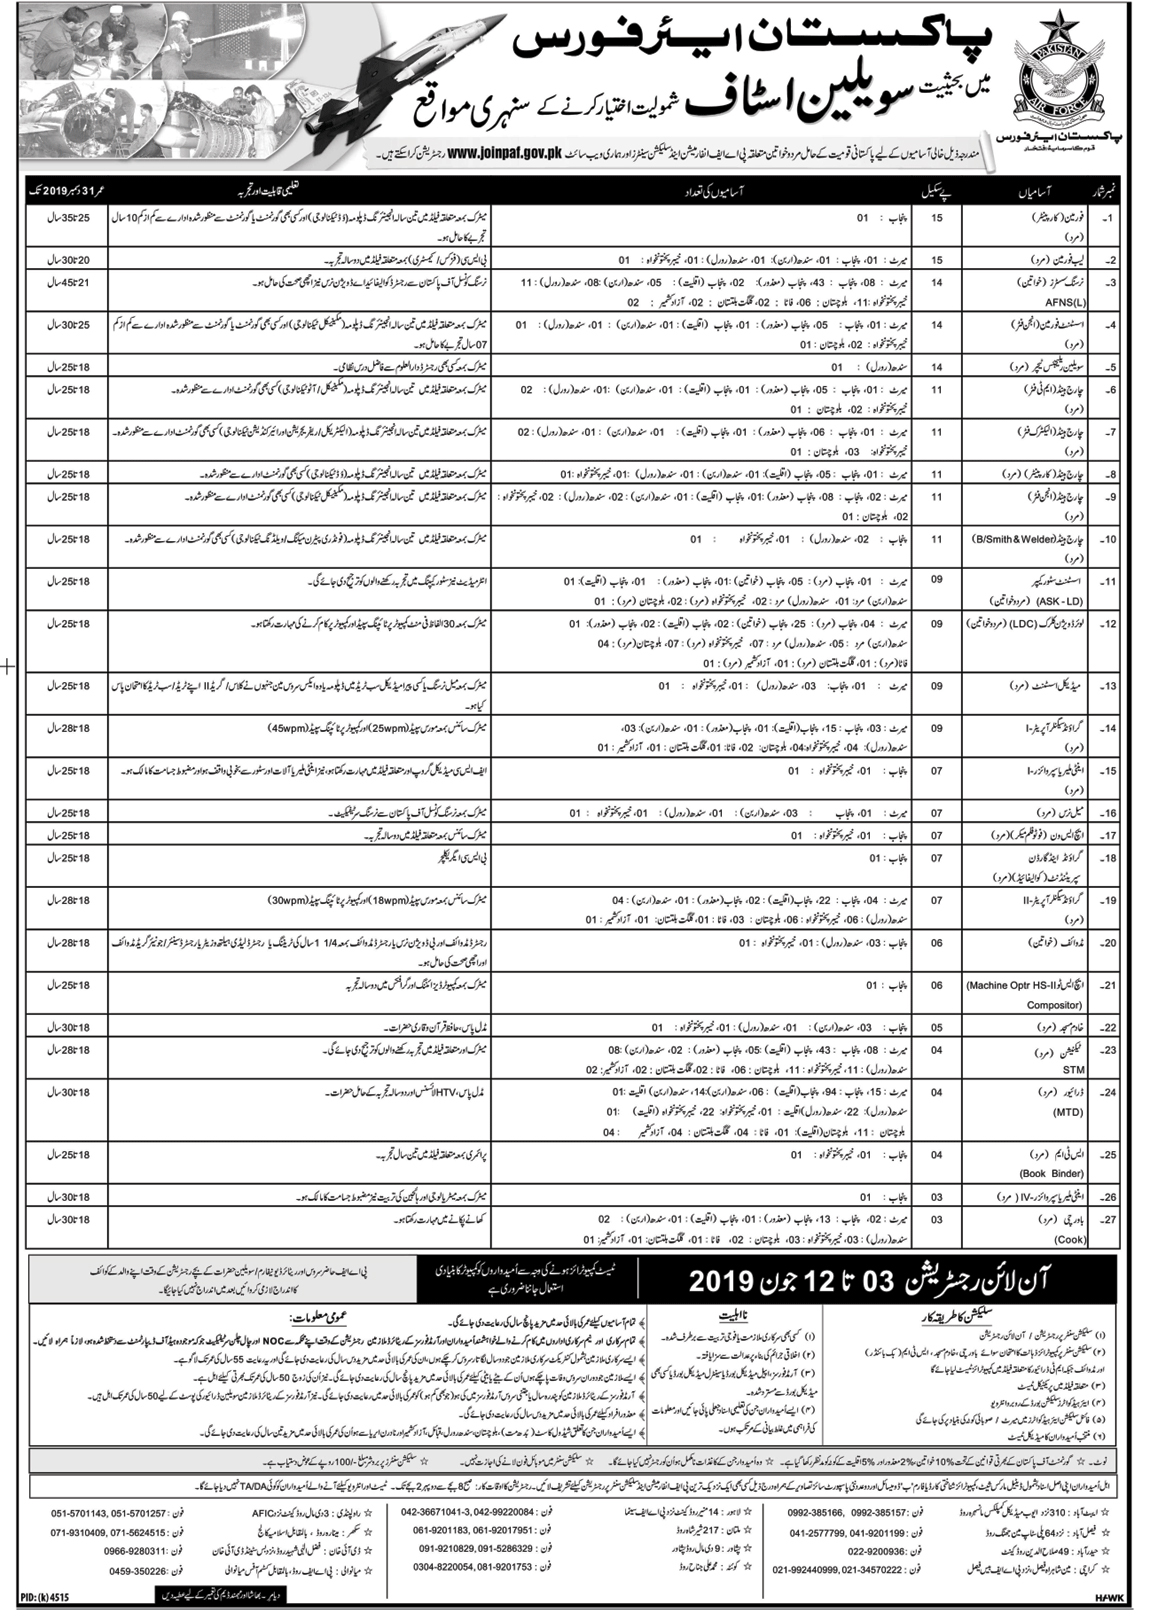 PAF Civilian Jobs 2019 Civilian Staff Online Registration